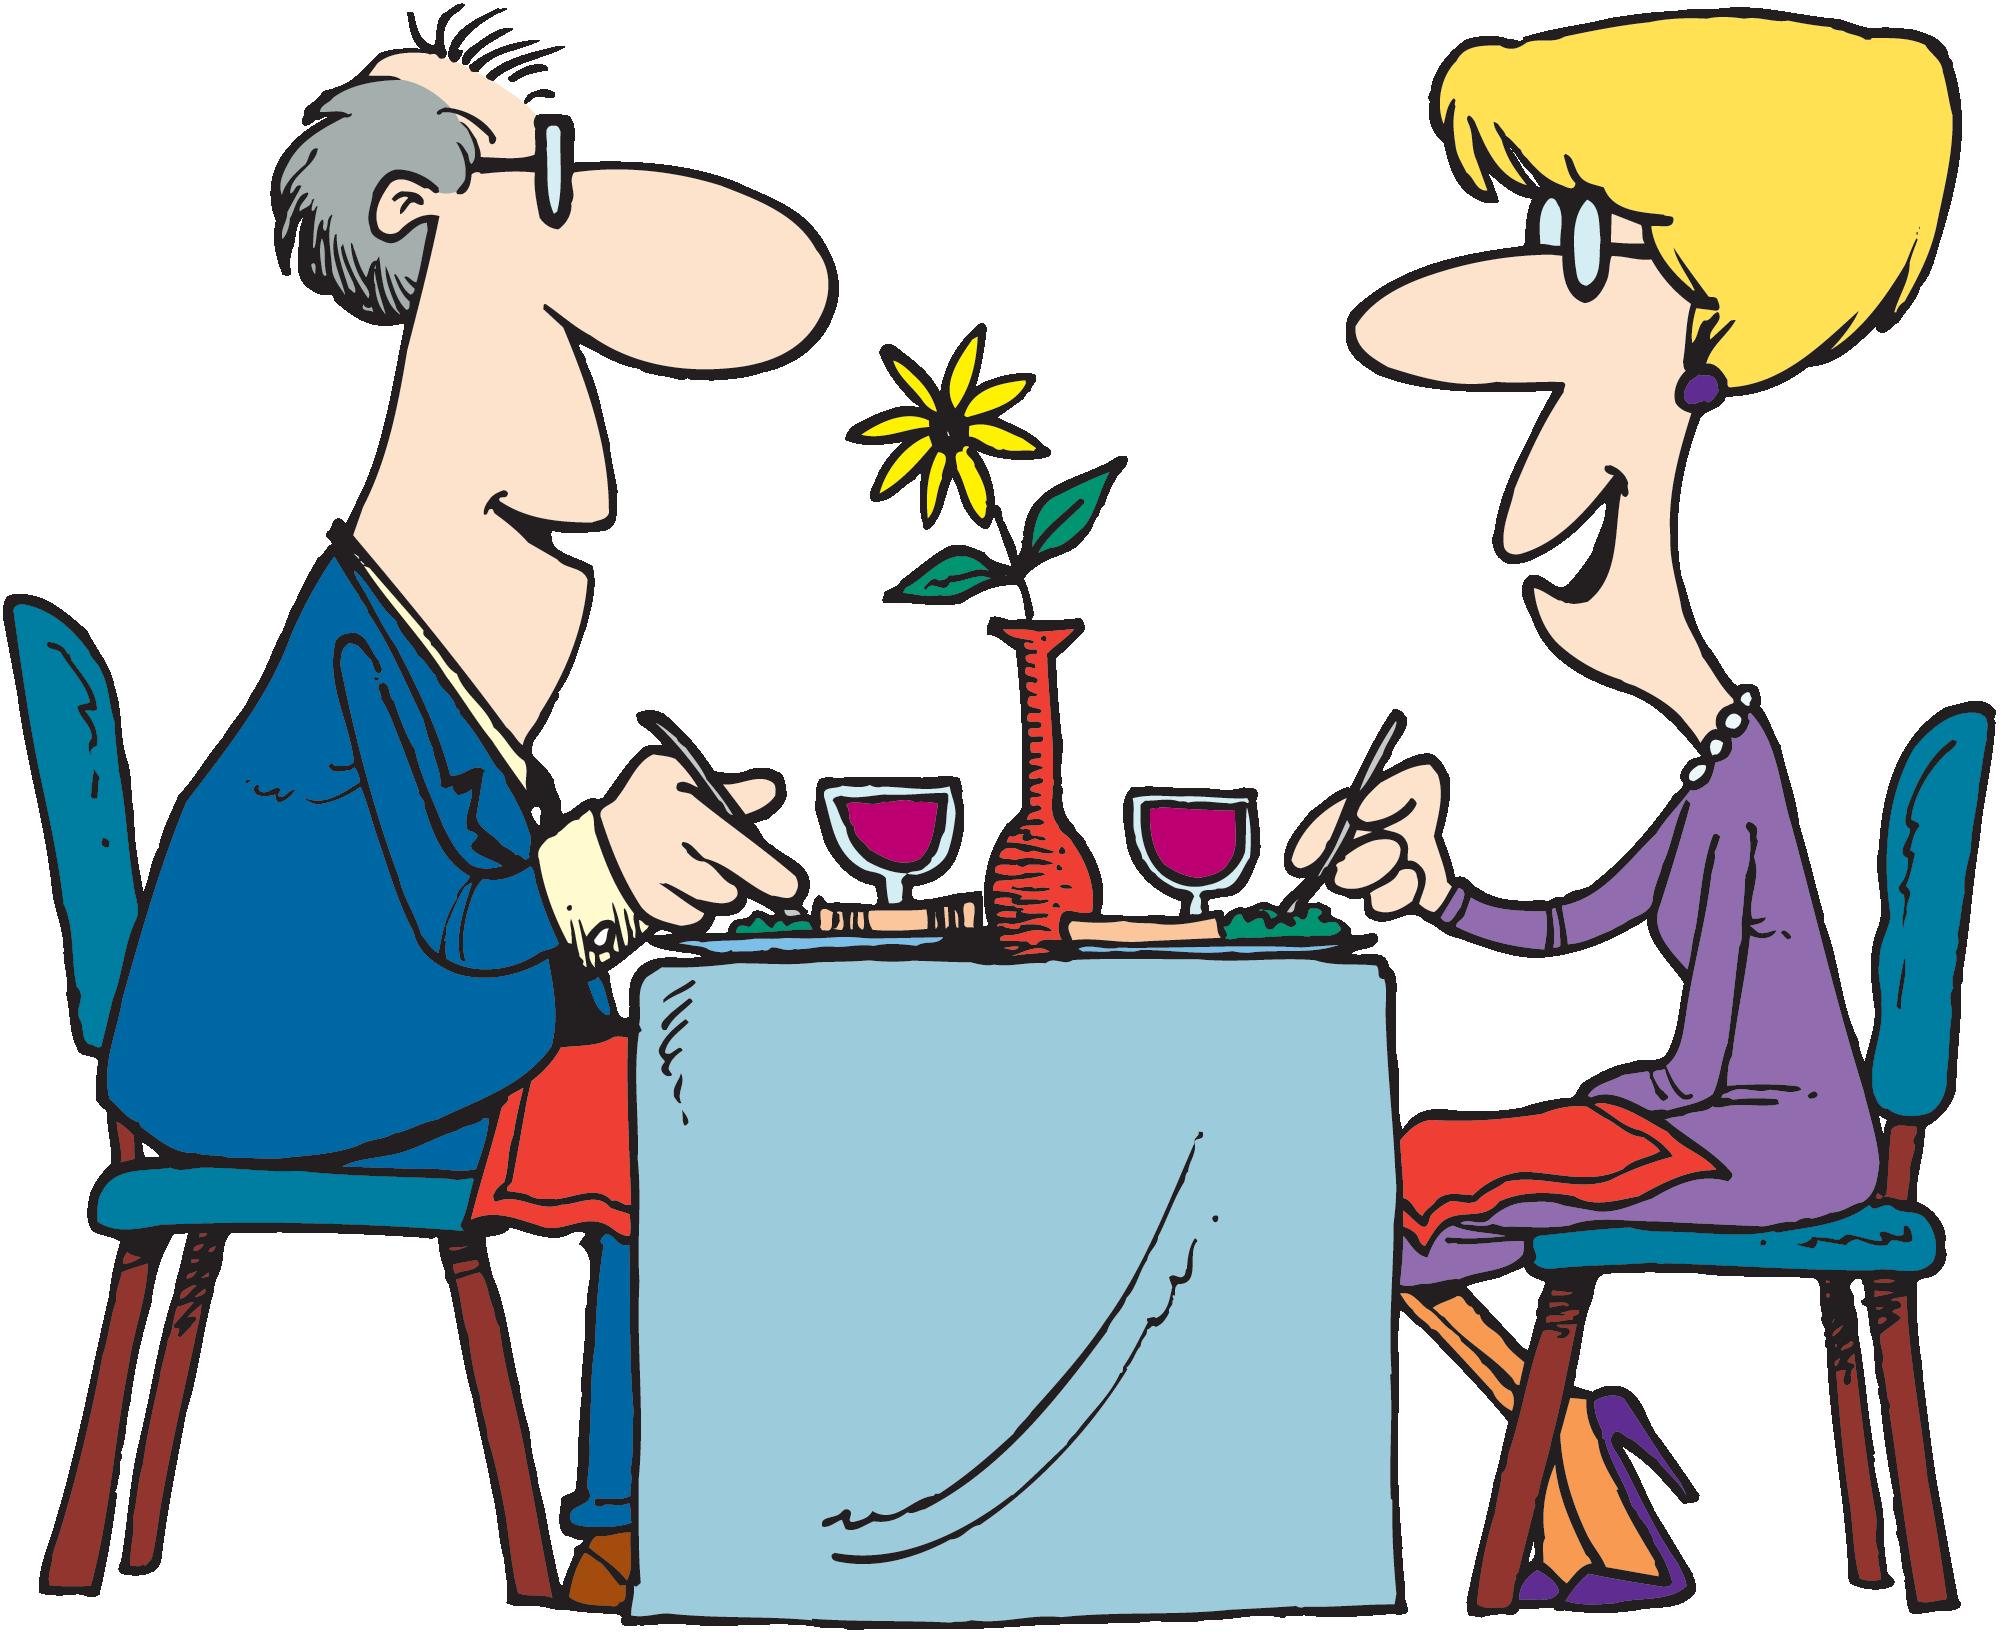 Furniture clipart restaurant table, Furniture restaurant table.